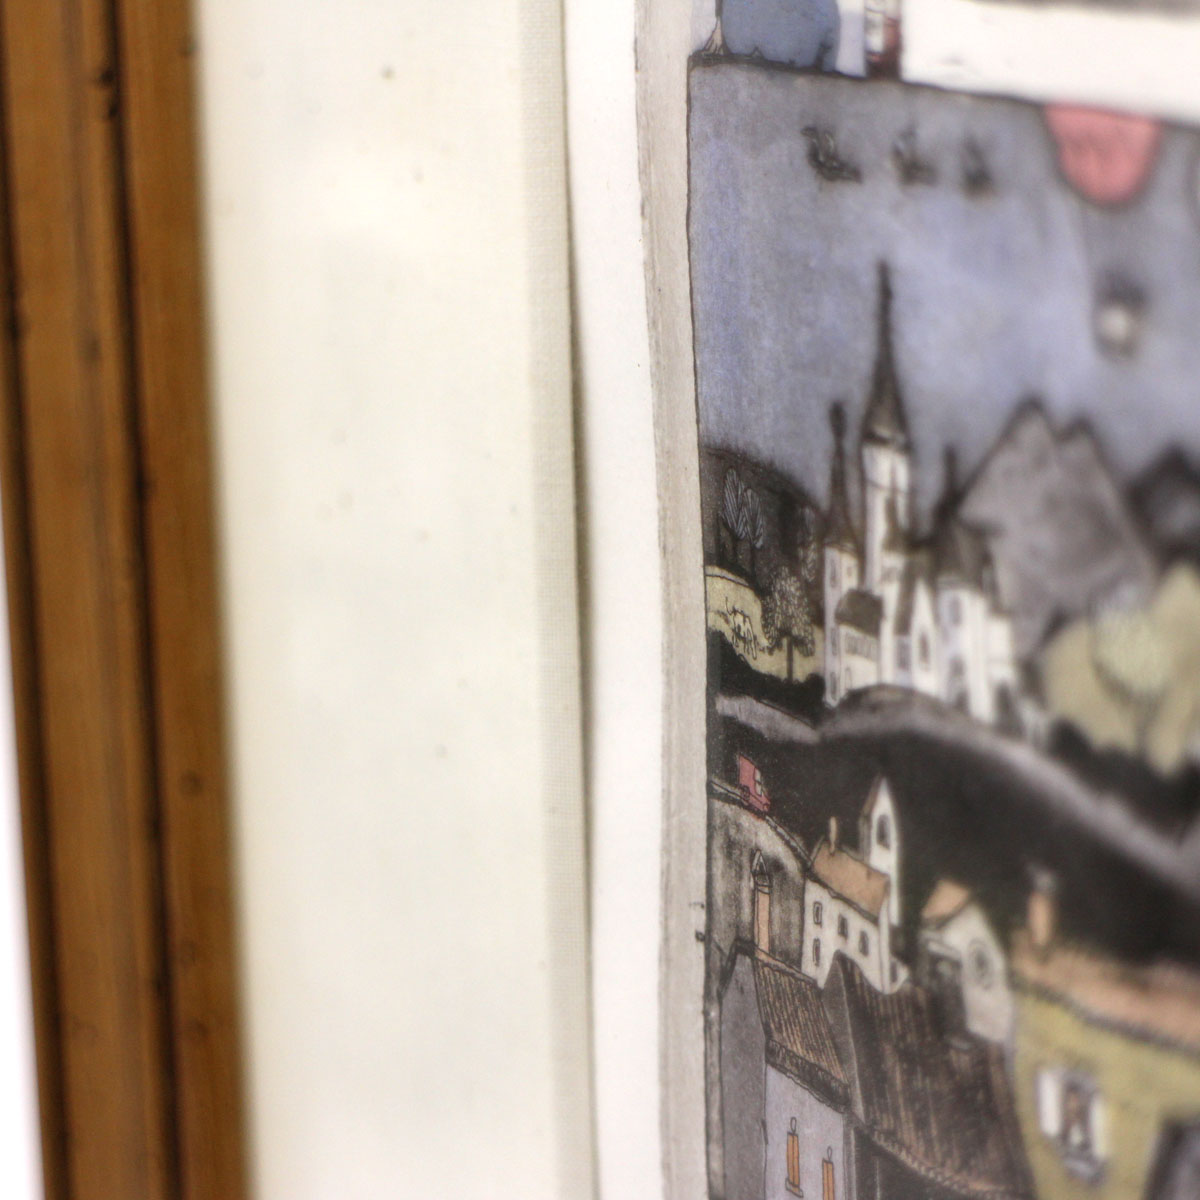 Graham Clarke グラハム・クラーク 銅版画ワイン物語エディションナンバー 279 300部限定 本人サイン8nPkOX0w